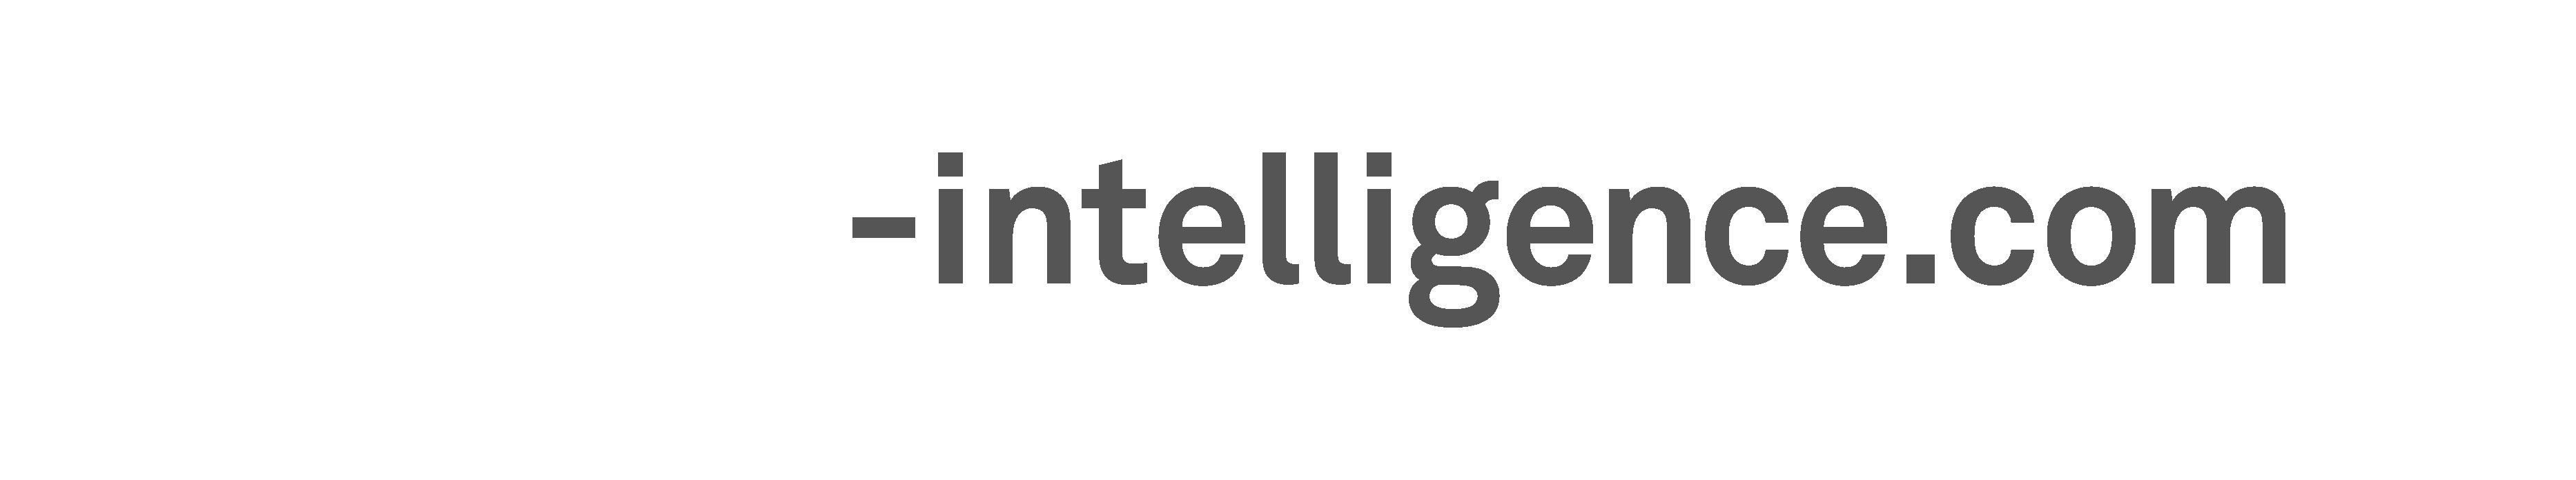 insight-intelligence.com